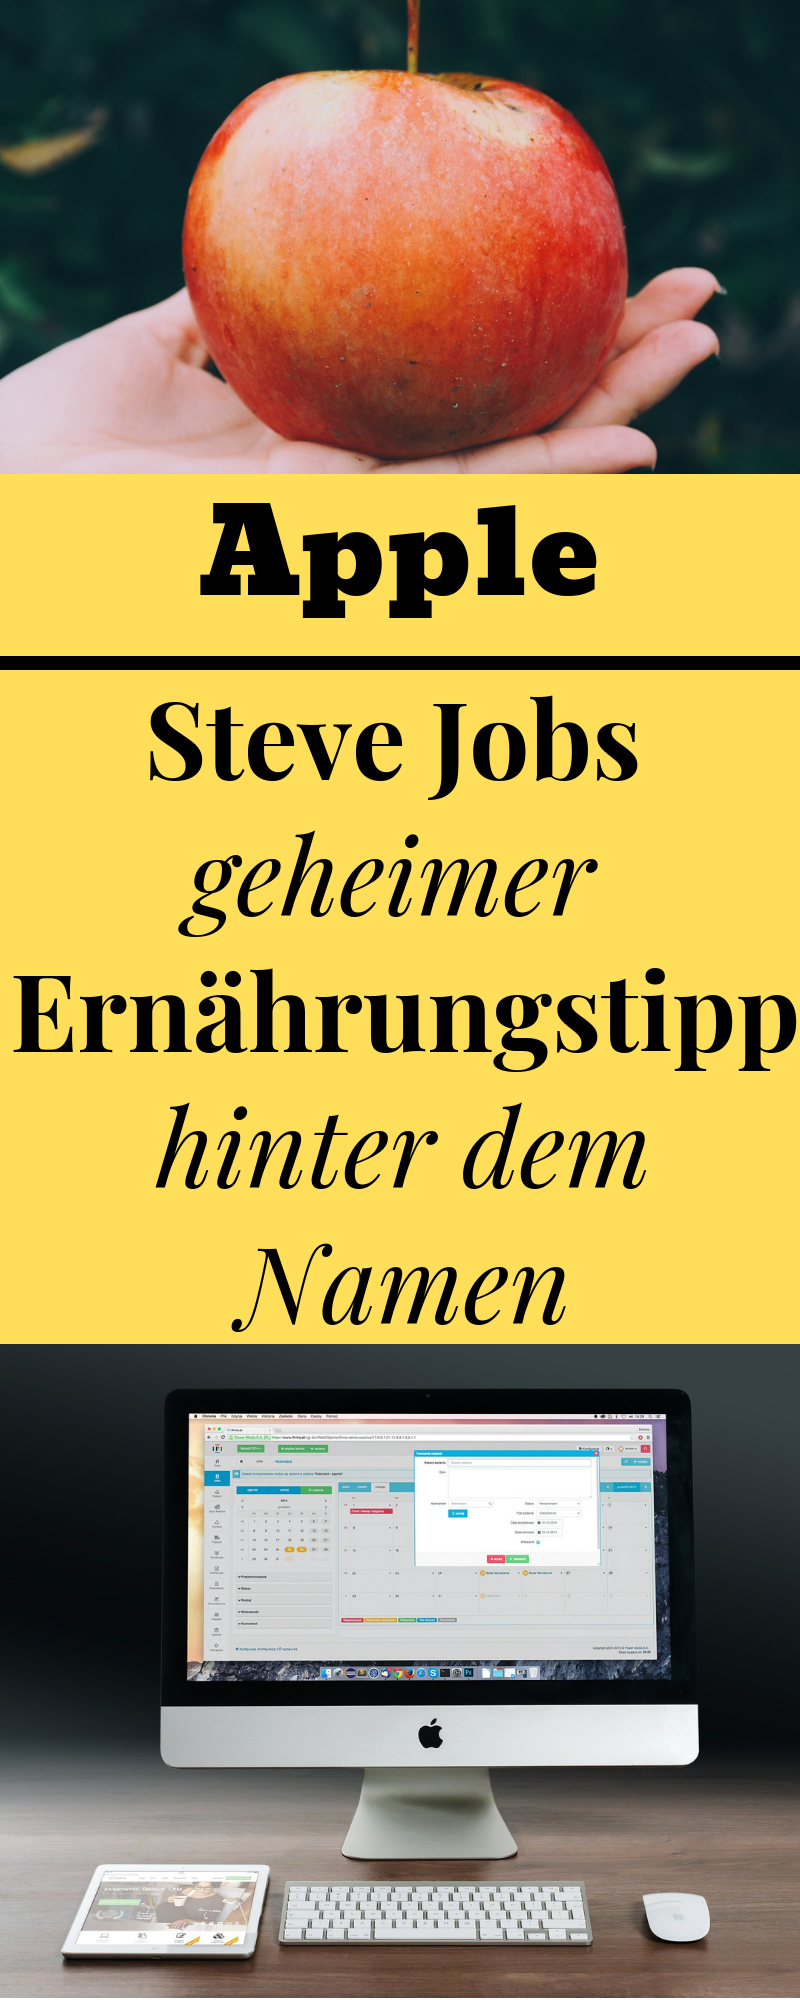 Wusstest Du Dass Selbst Steve Jobs Apple Nach Einer Speziellen Ernahrung Benannt Hat Geheimdiat Er Nutrition Jobs Nutrition Meal Plan Pizza Nutrition Facts